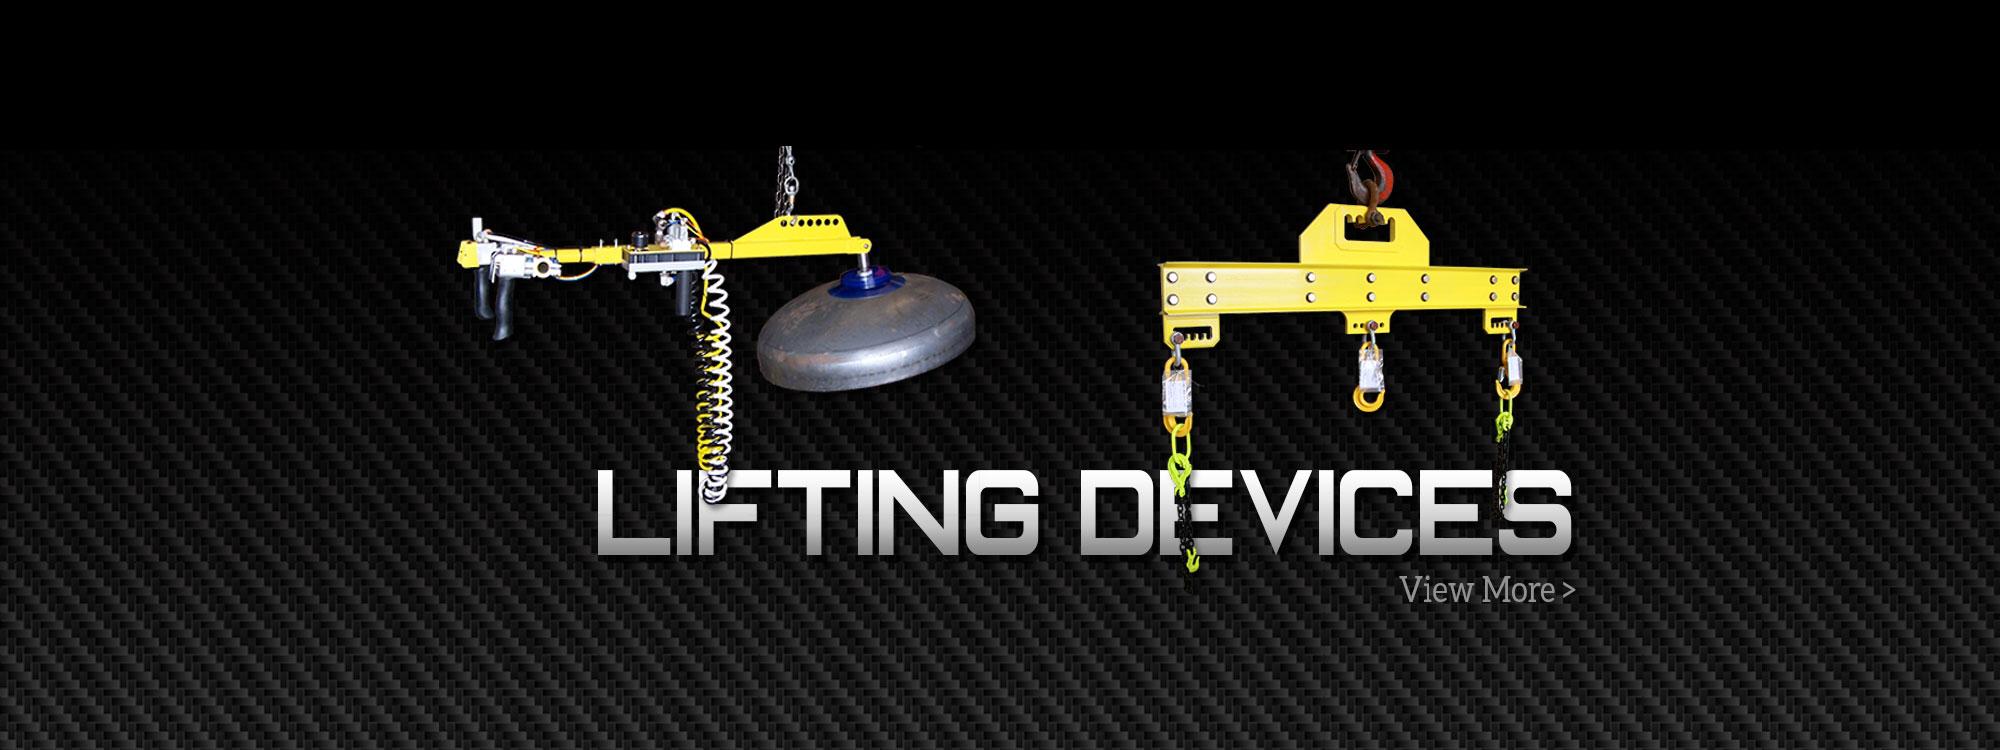 liftingdevices